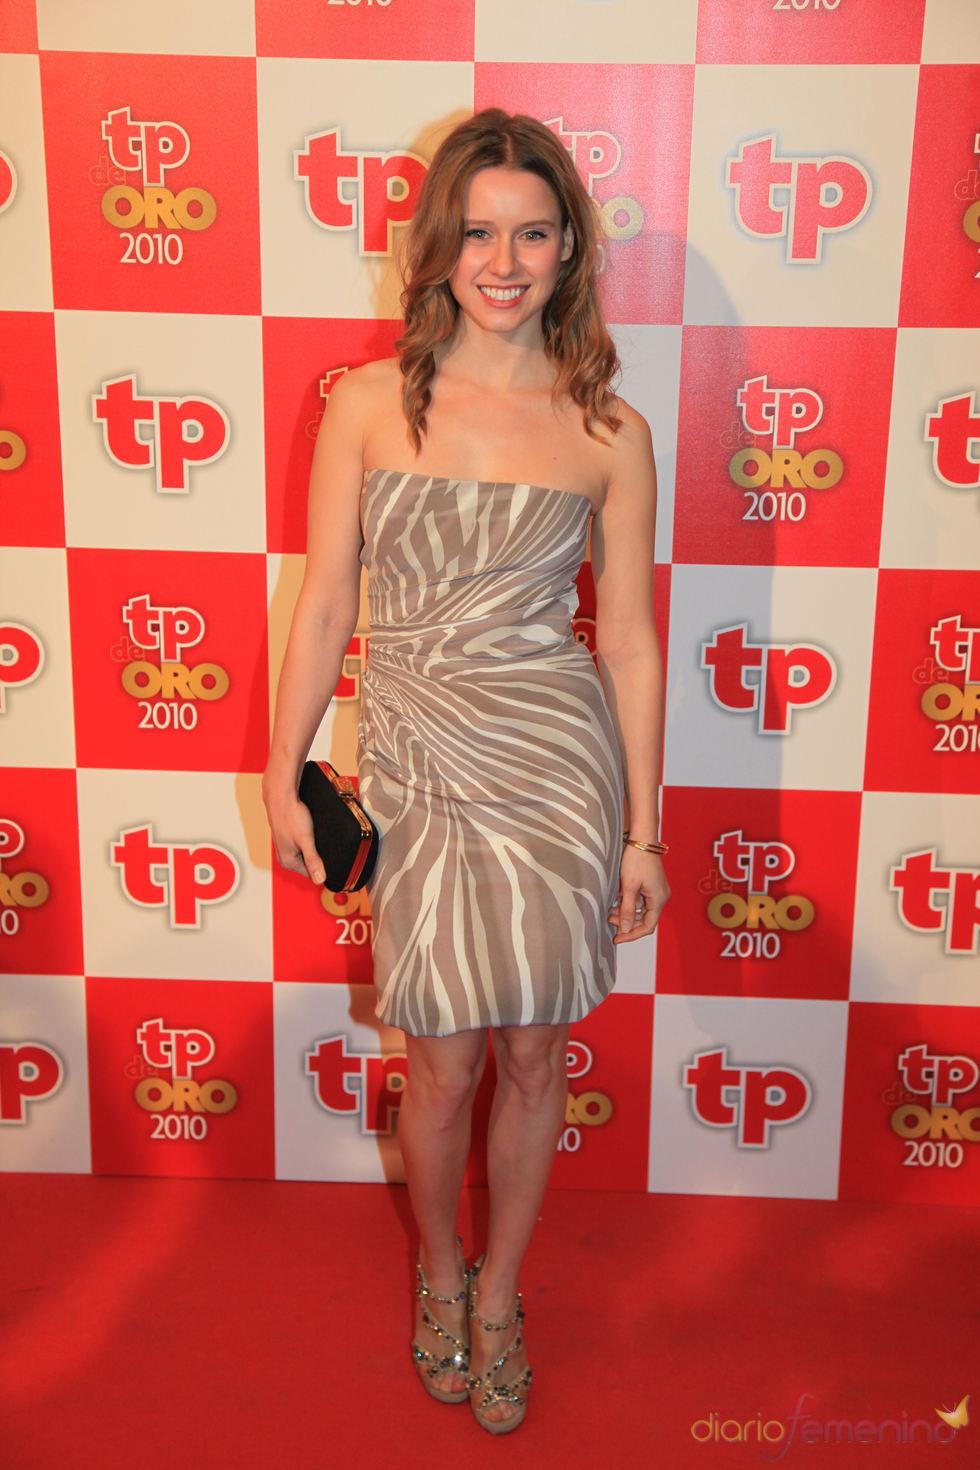 Manuela Vellés, de 'Hispania', en los TP de Oro 2010